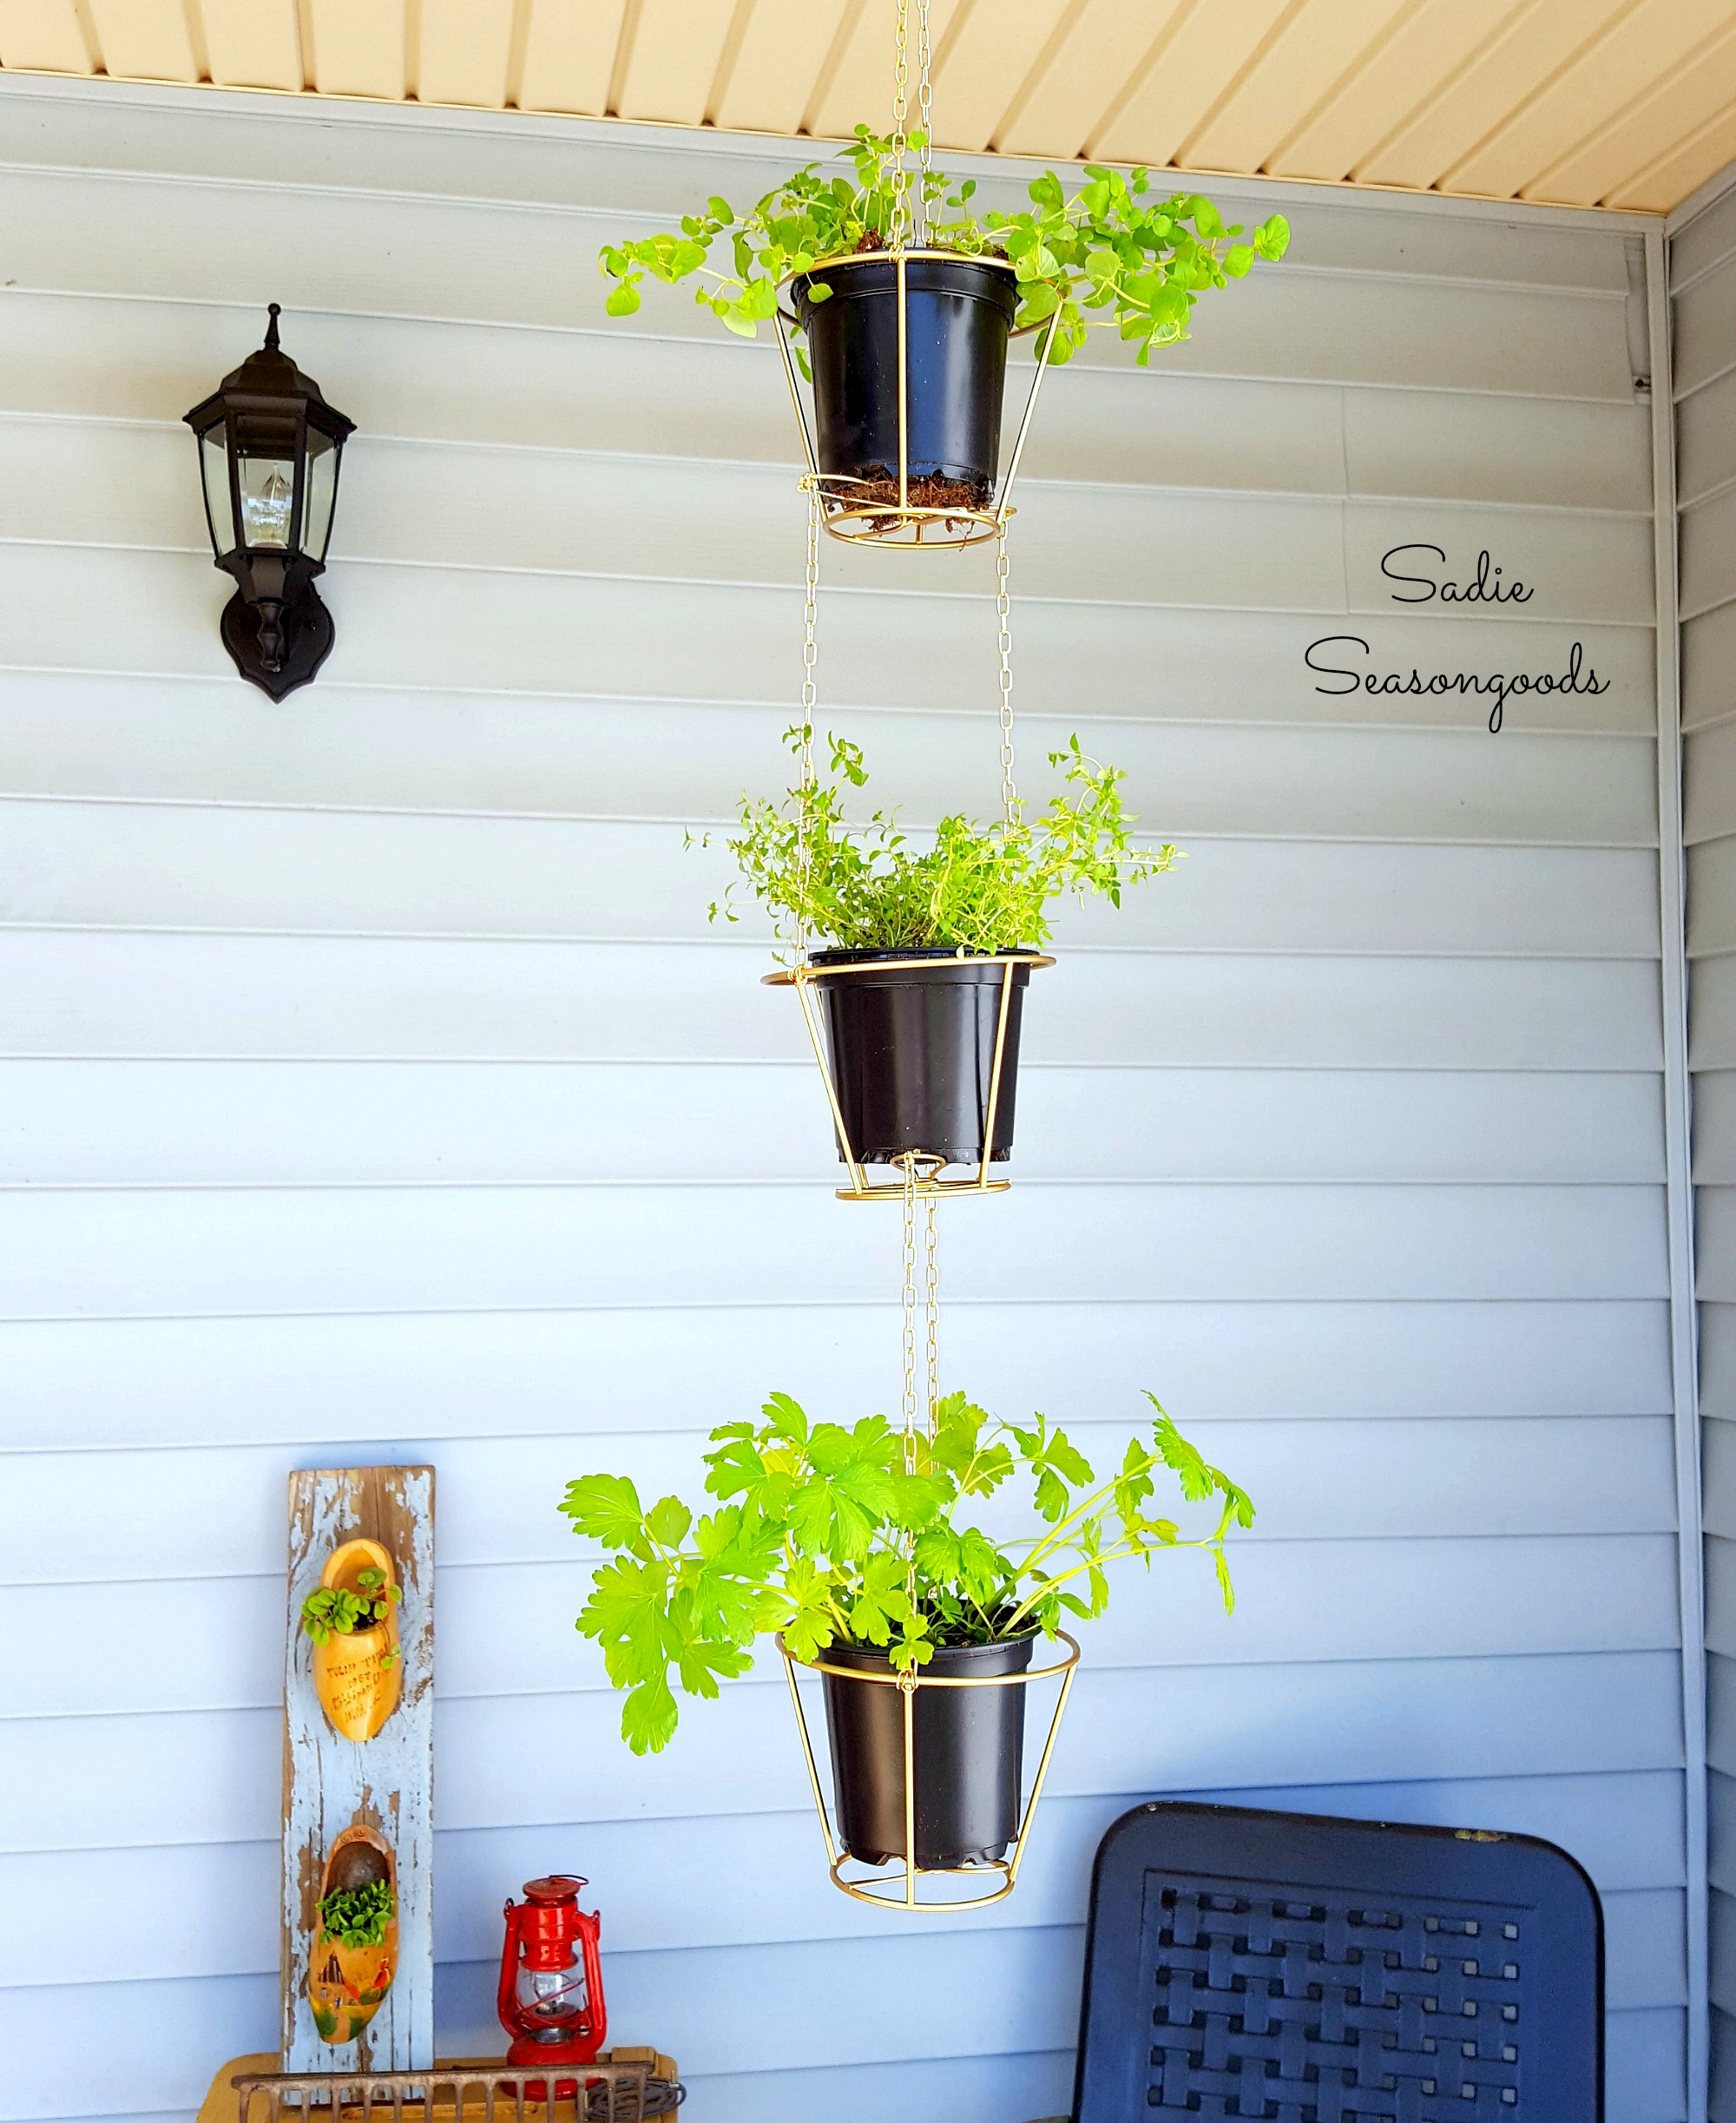 9_thrift_store_lampshades_repurposed_as_hanging_herb_baskets_Sadie_Seasongoods-1